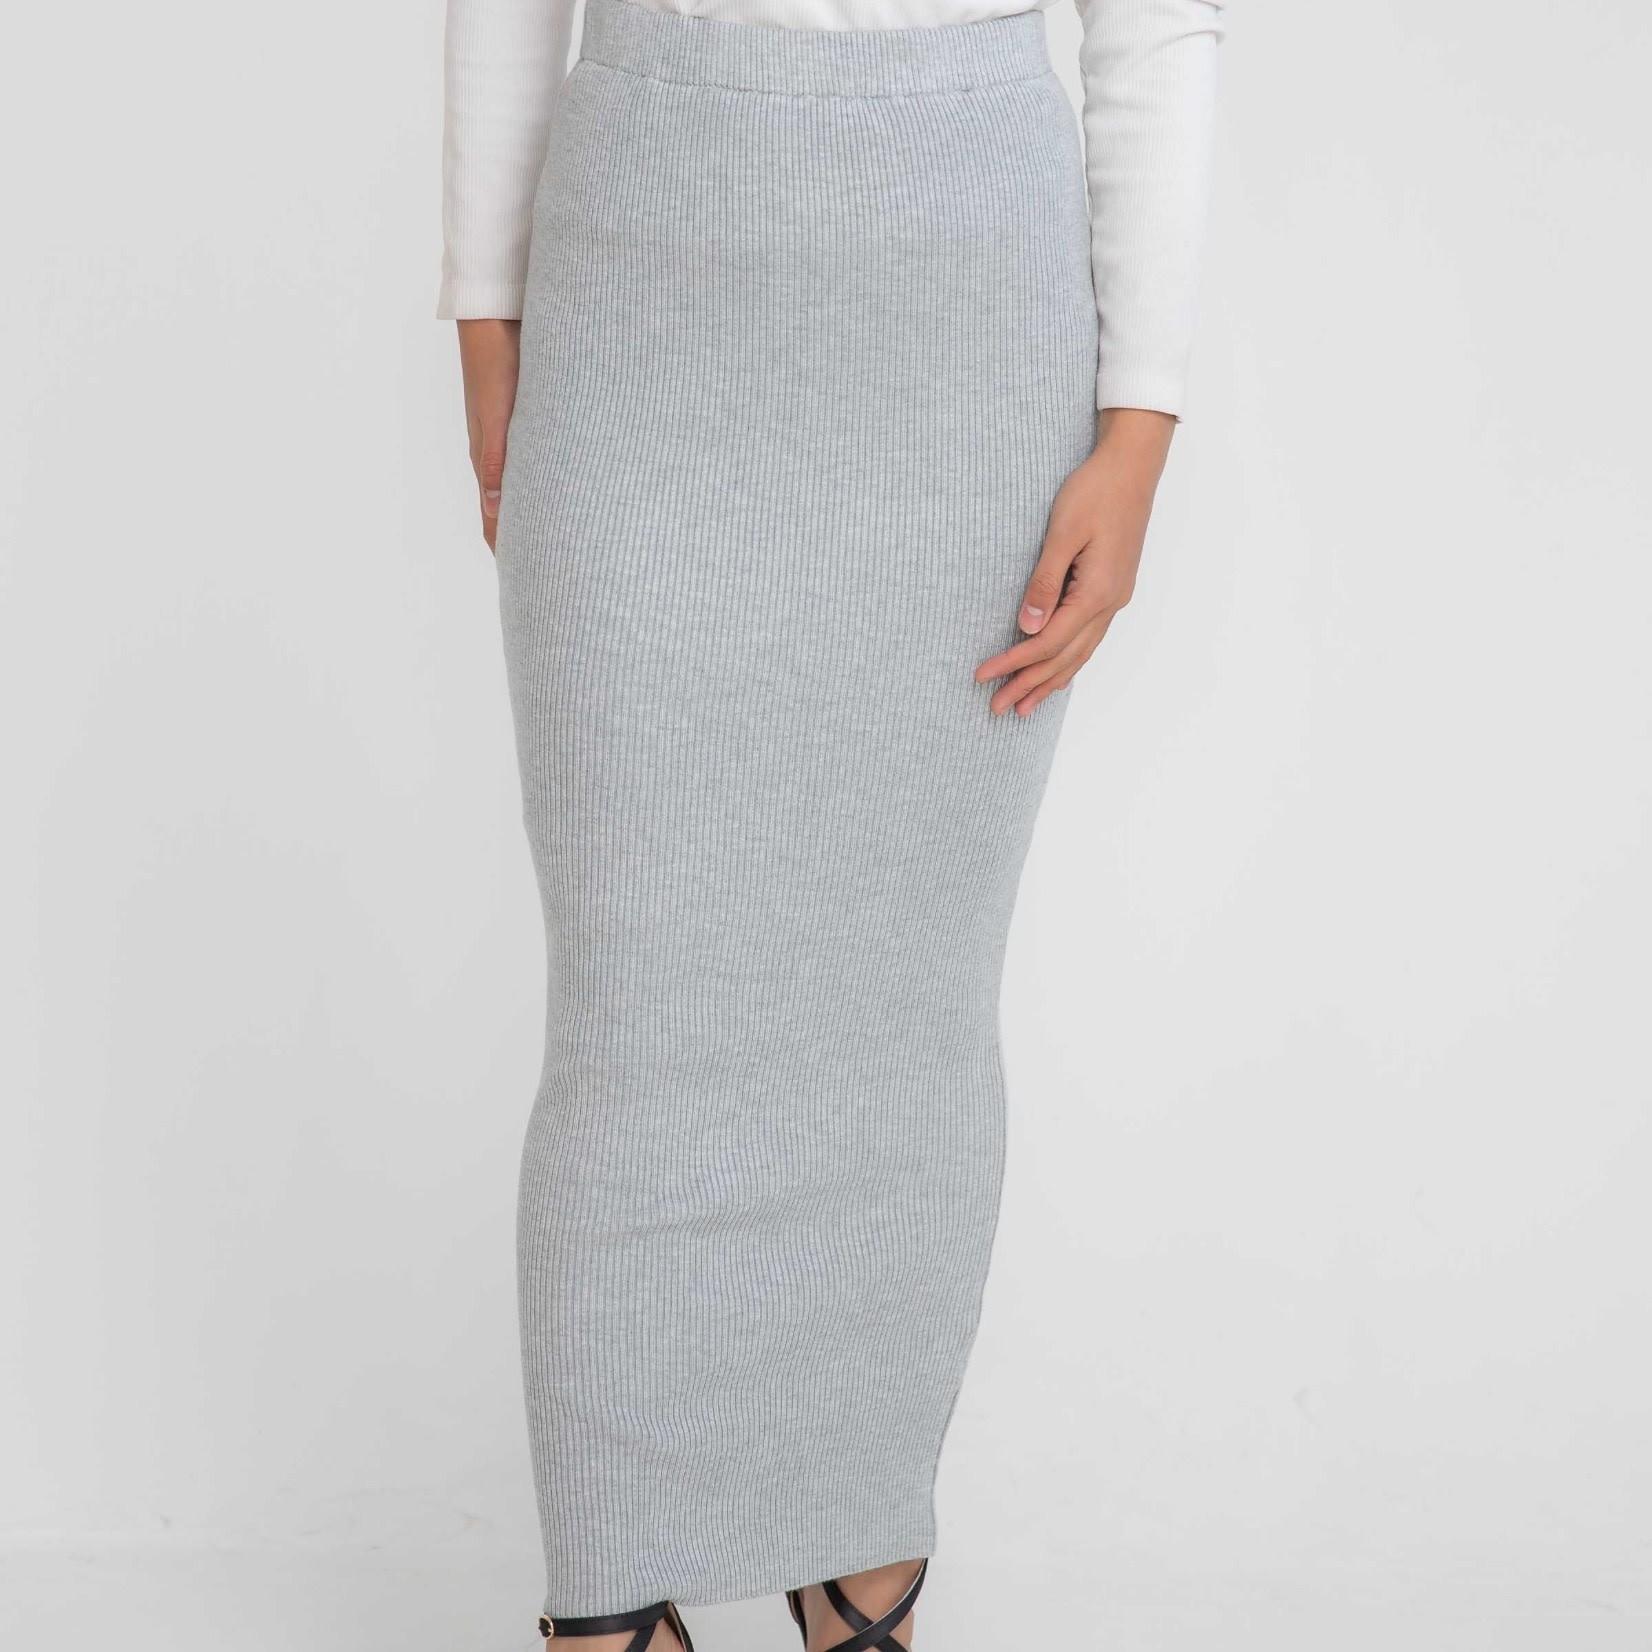 Nasiba Fashion Light Grey Ribbed Skirt